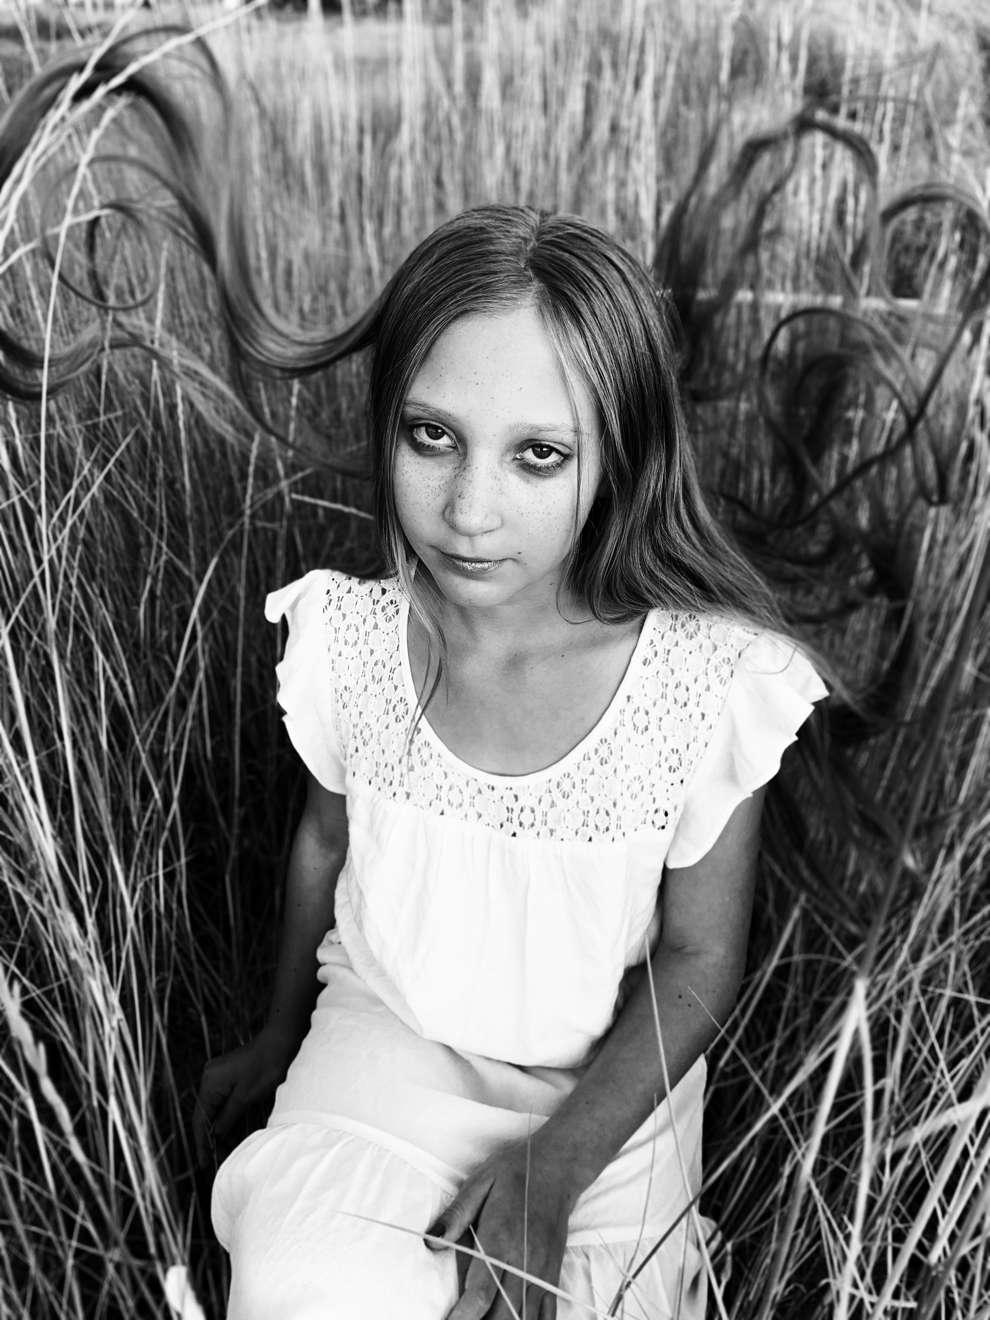 Kiyah Clements